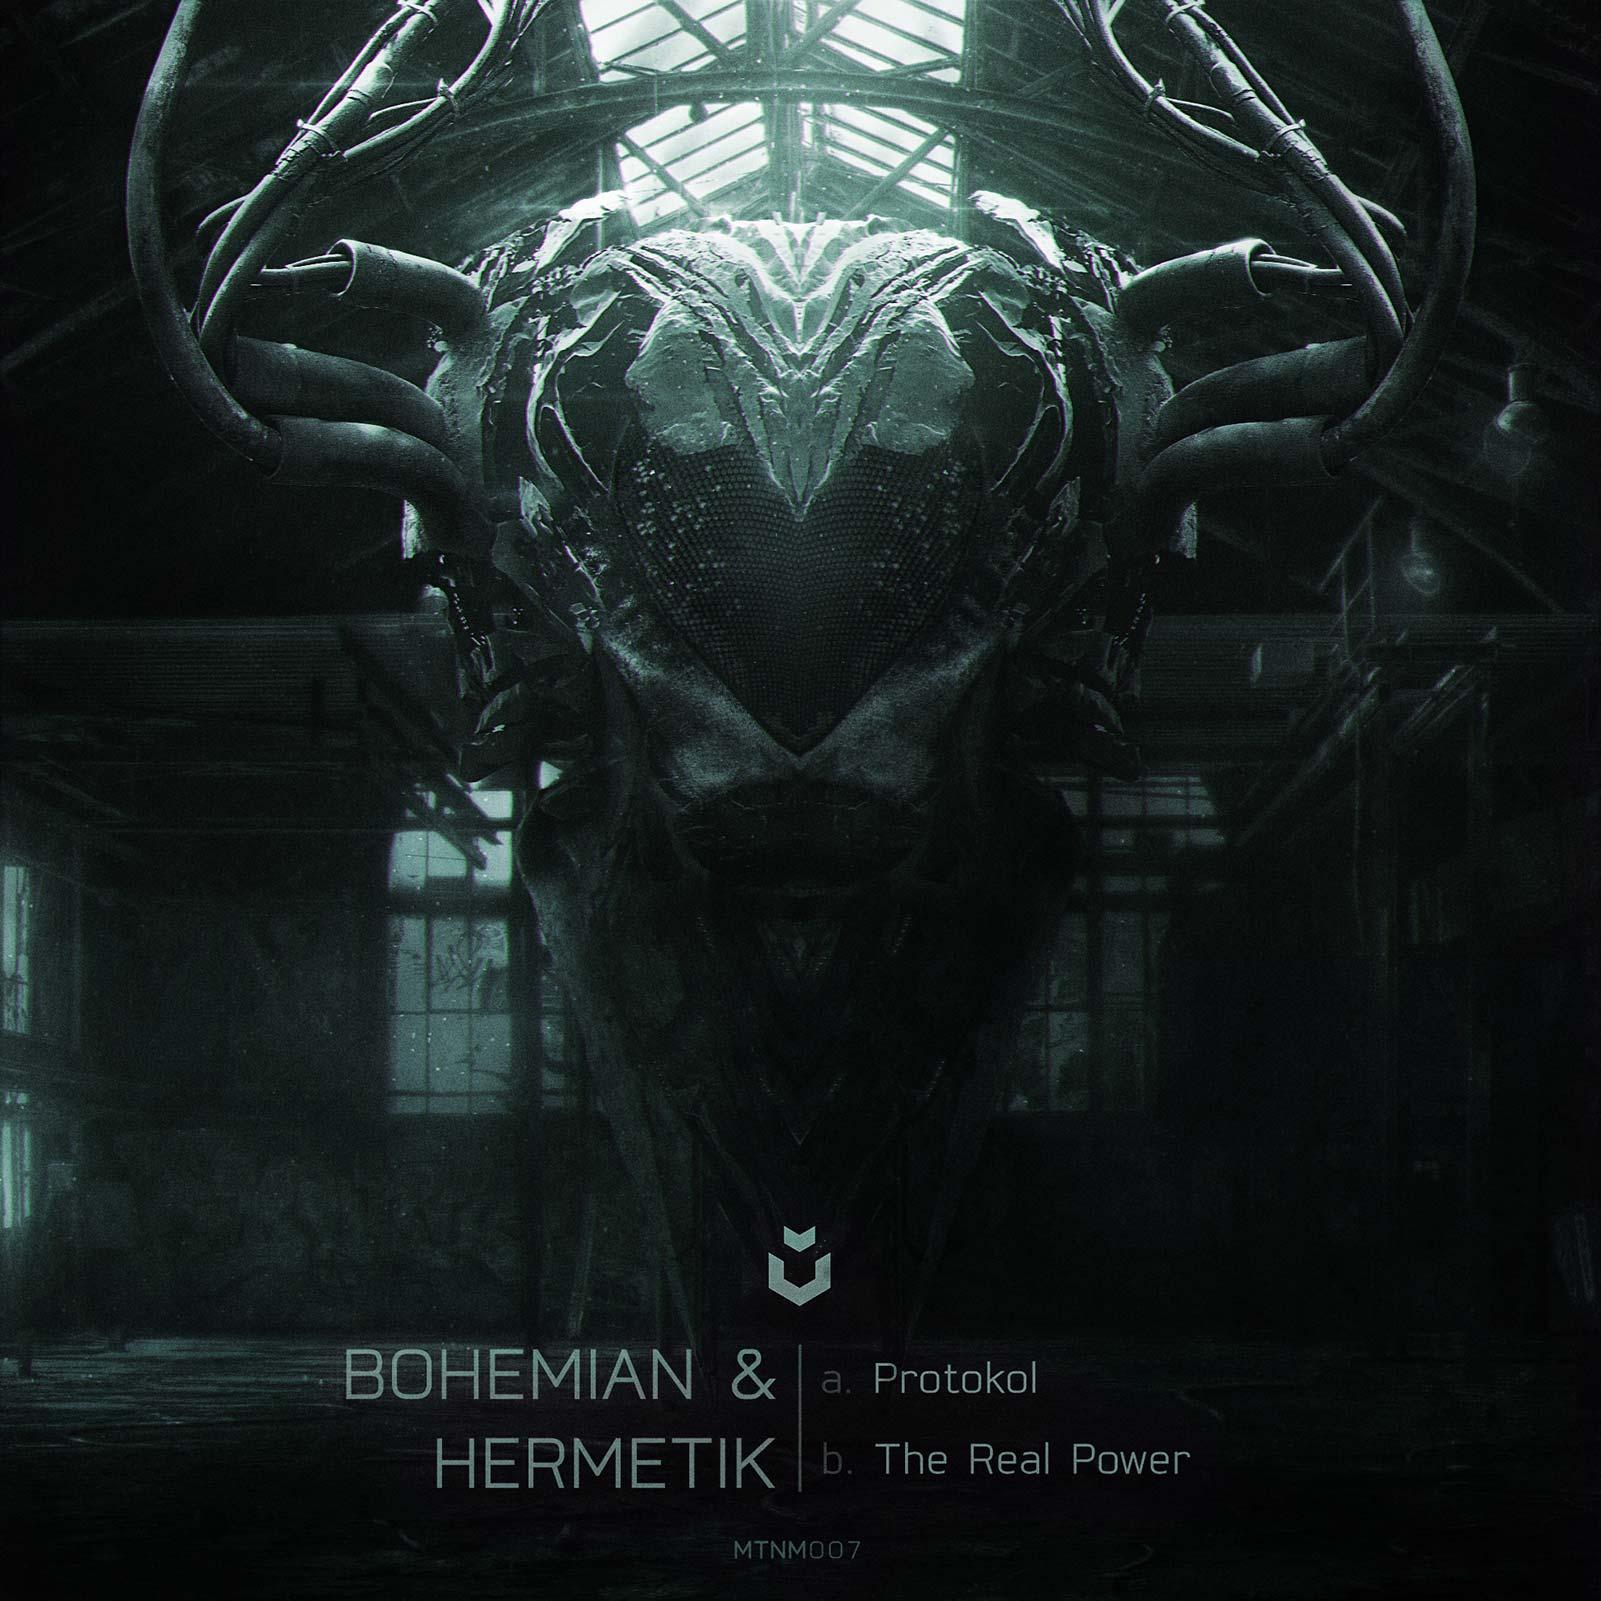 Umut präsentiert: Bohemian & Hermetik – Protokol / The Real Power (Metnem)